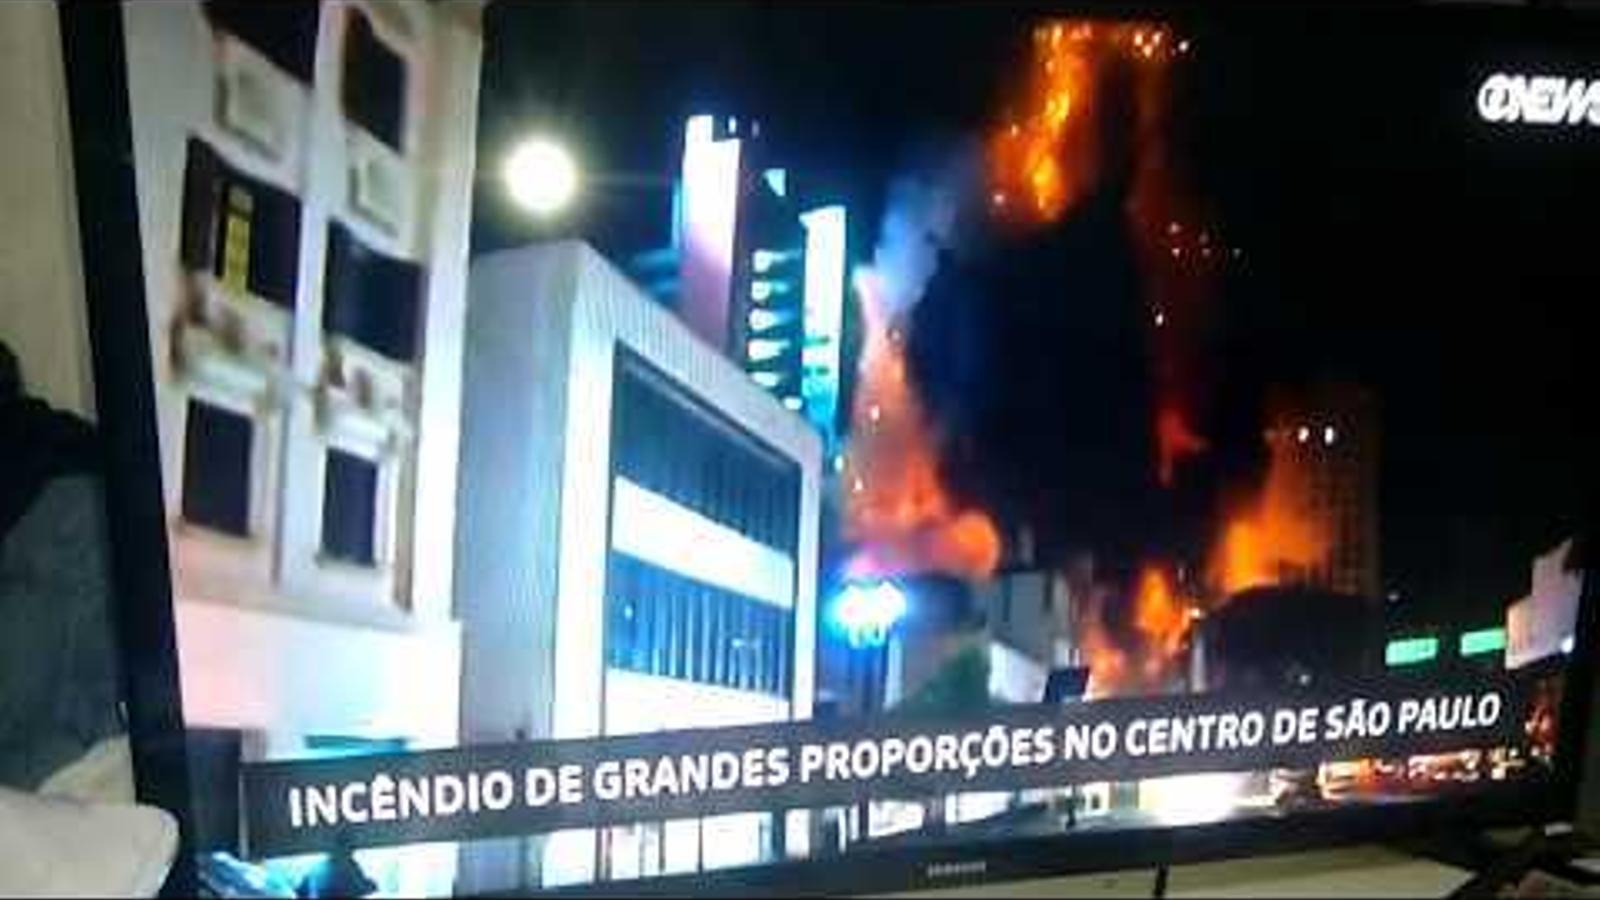 Un gratacel s'esfondra en un incendi a Sao Paolo